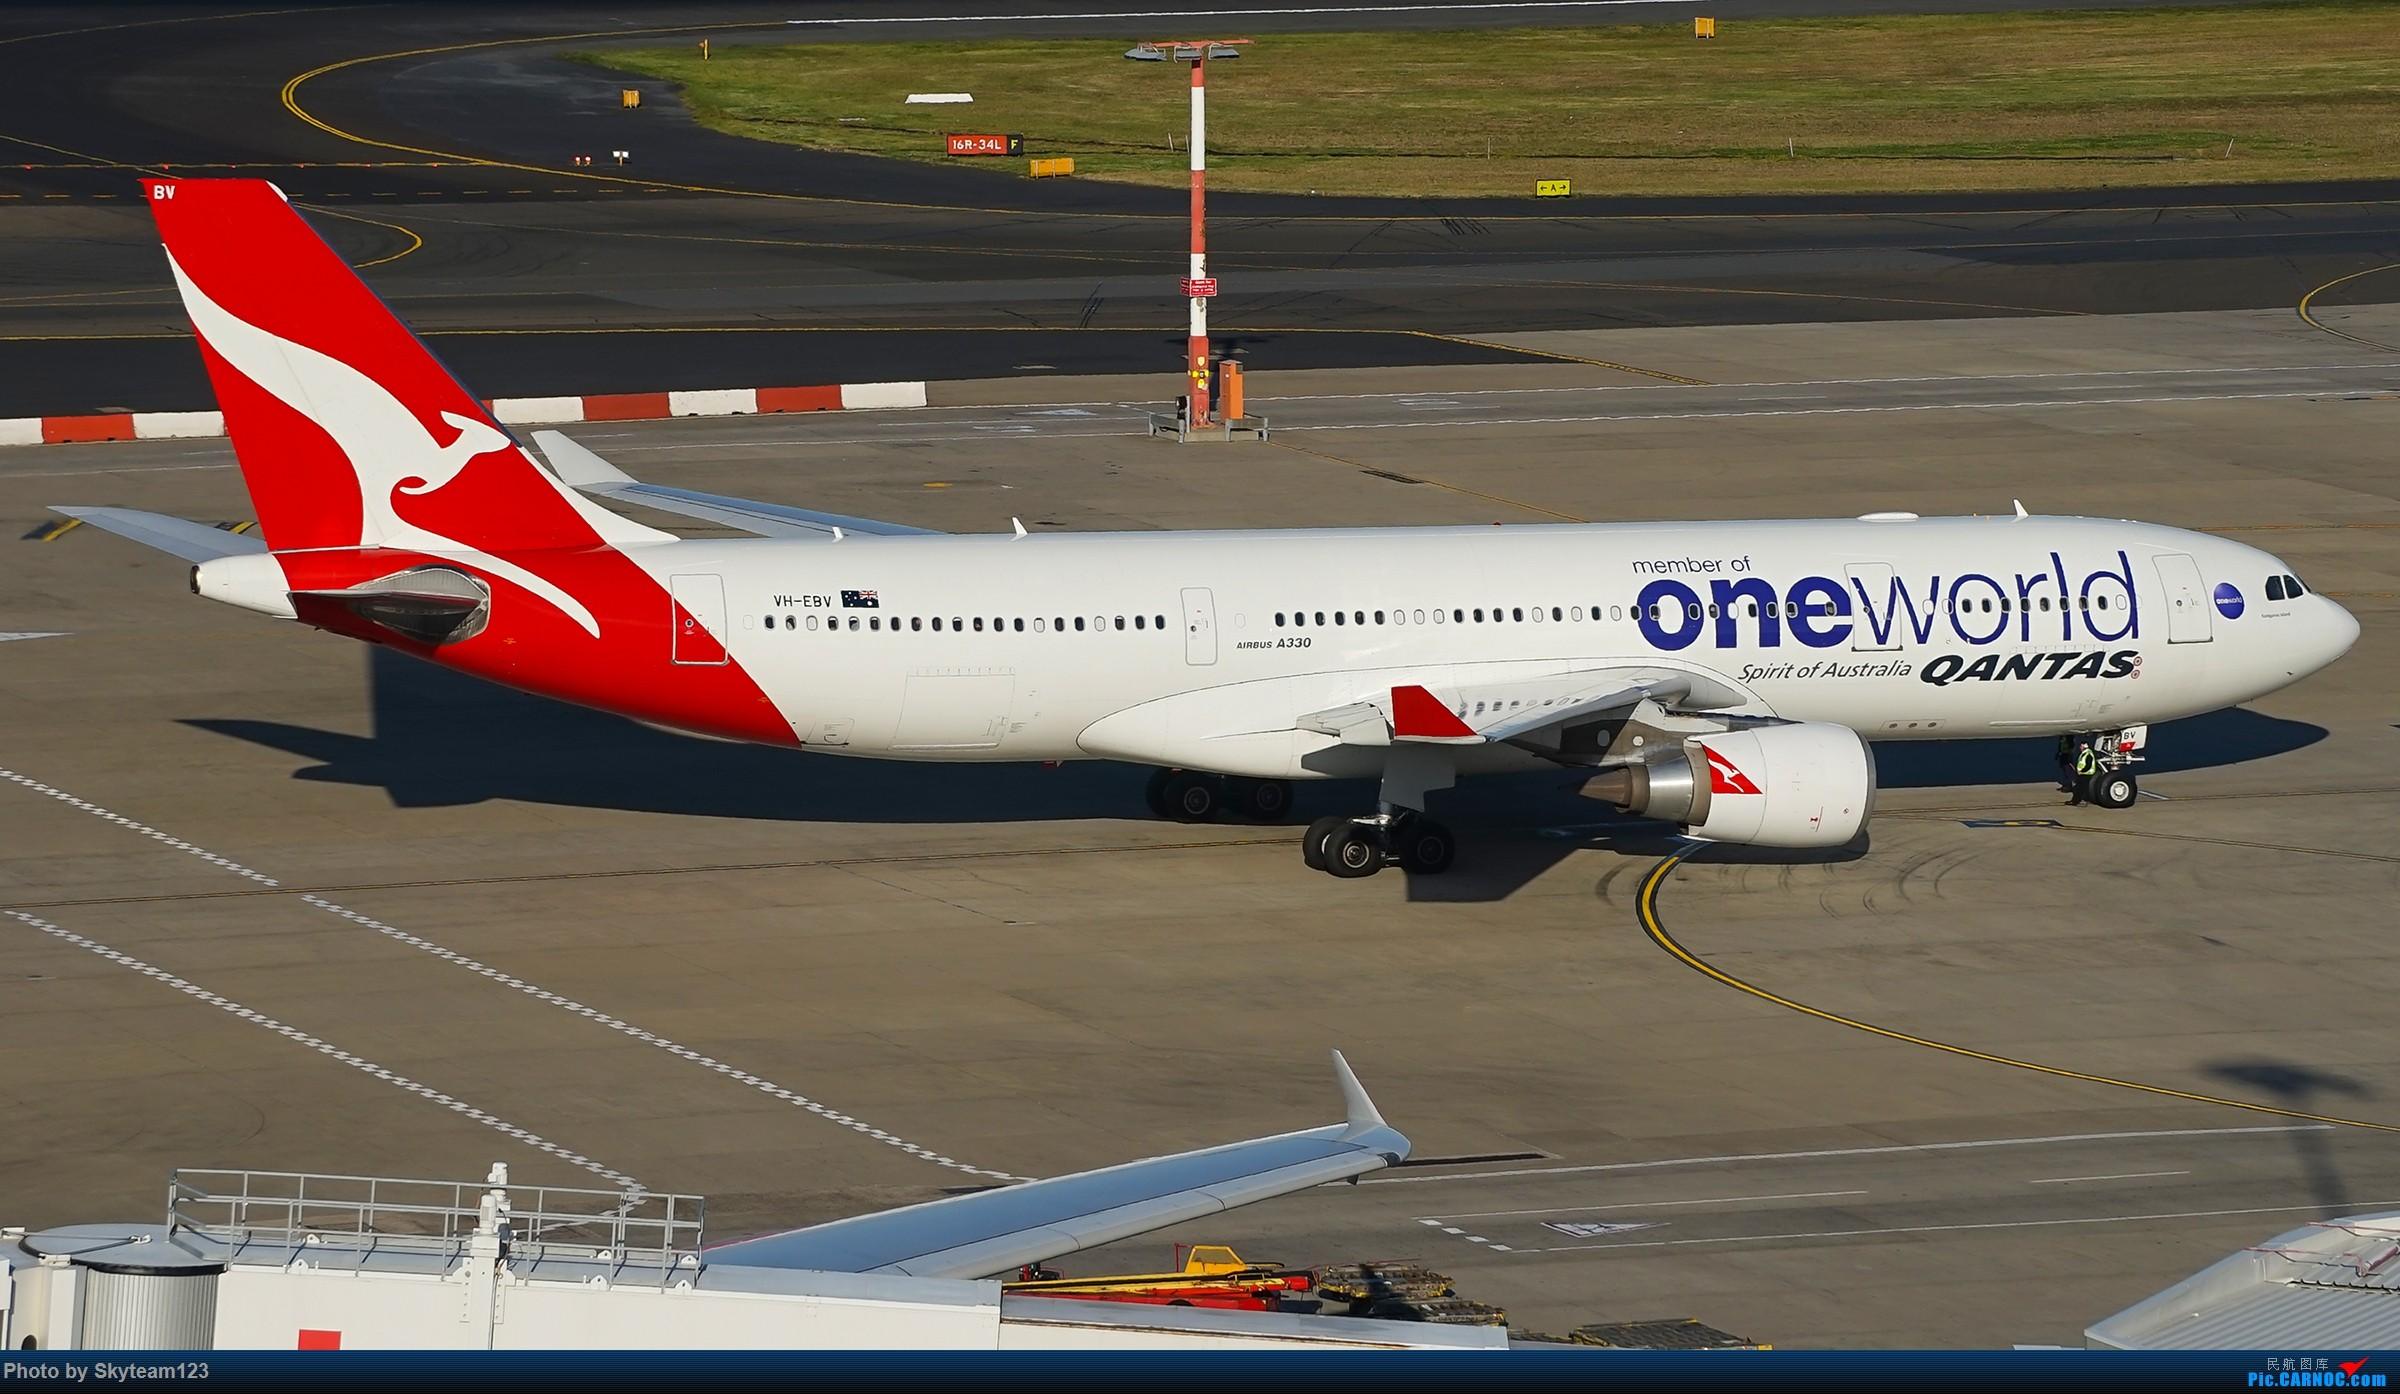 Re:[原创][SYD] 假期拍机小结 解锁16R跑道头拍机位 & 停车楼拍机作业 【全宽体】 AIRBUS A330-200 VH-EBV 澳大利亚悉尼金斯福德·史密斯机场